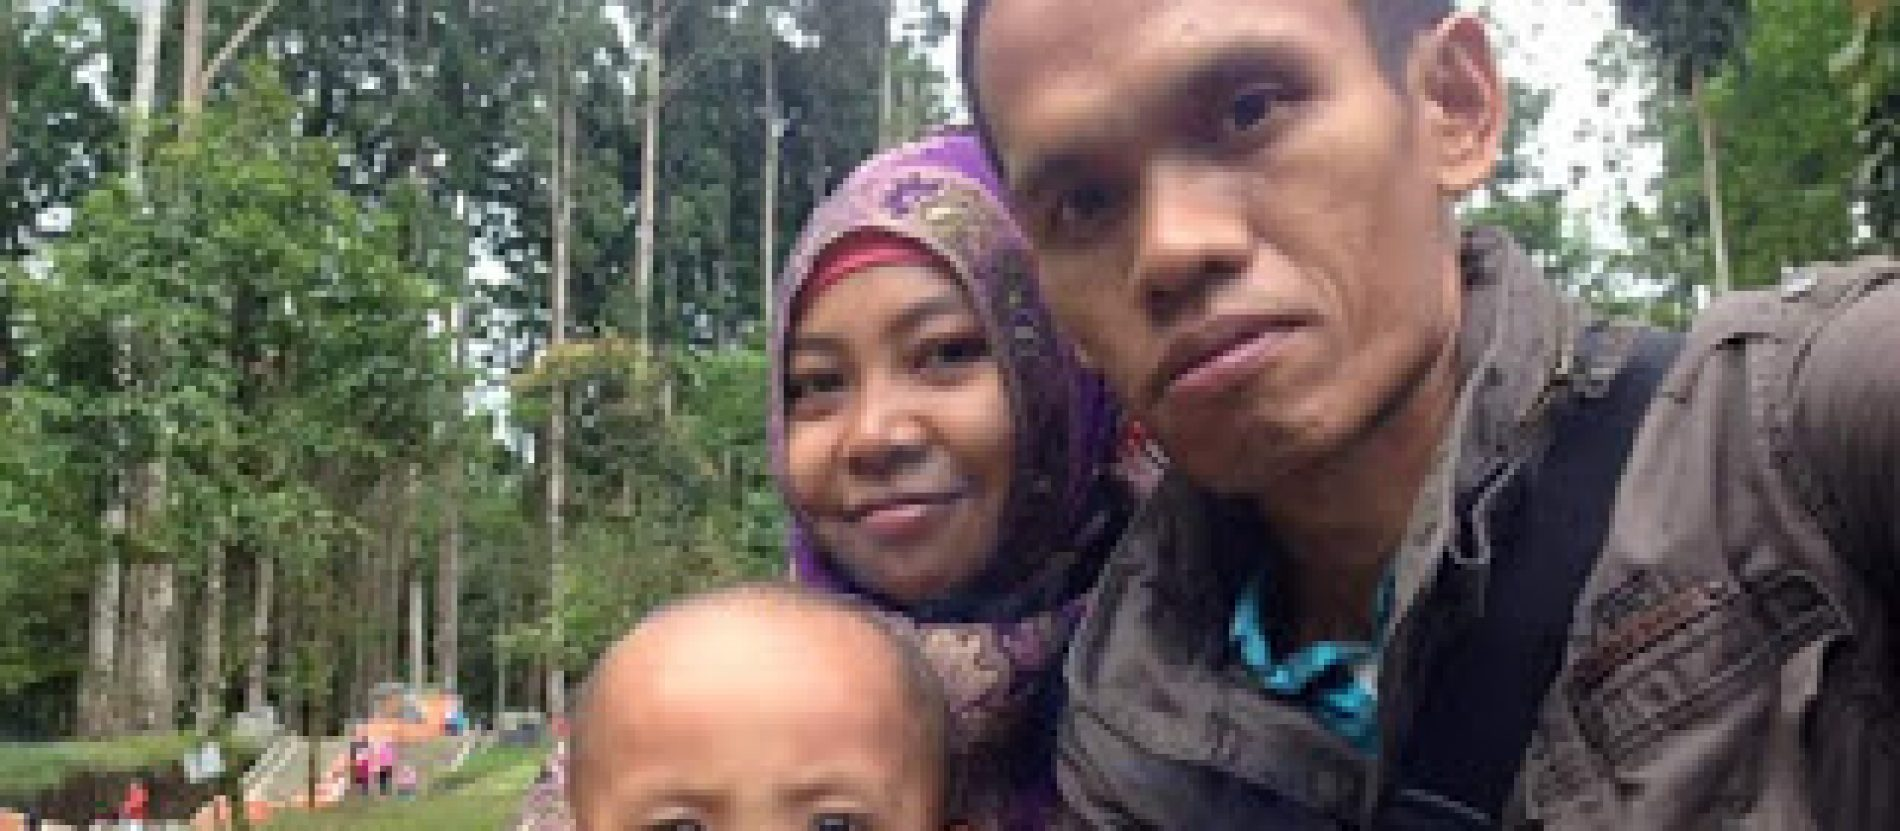 Berwisata murah meriah bersama keluarga